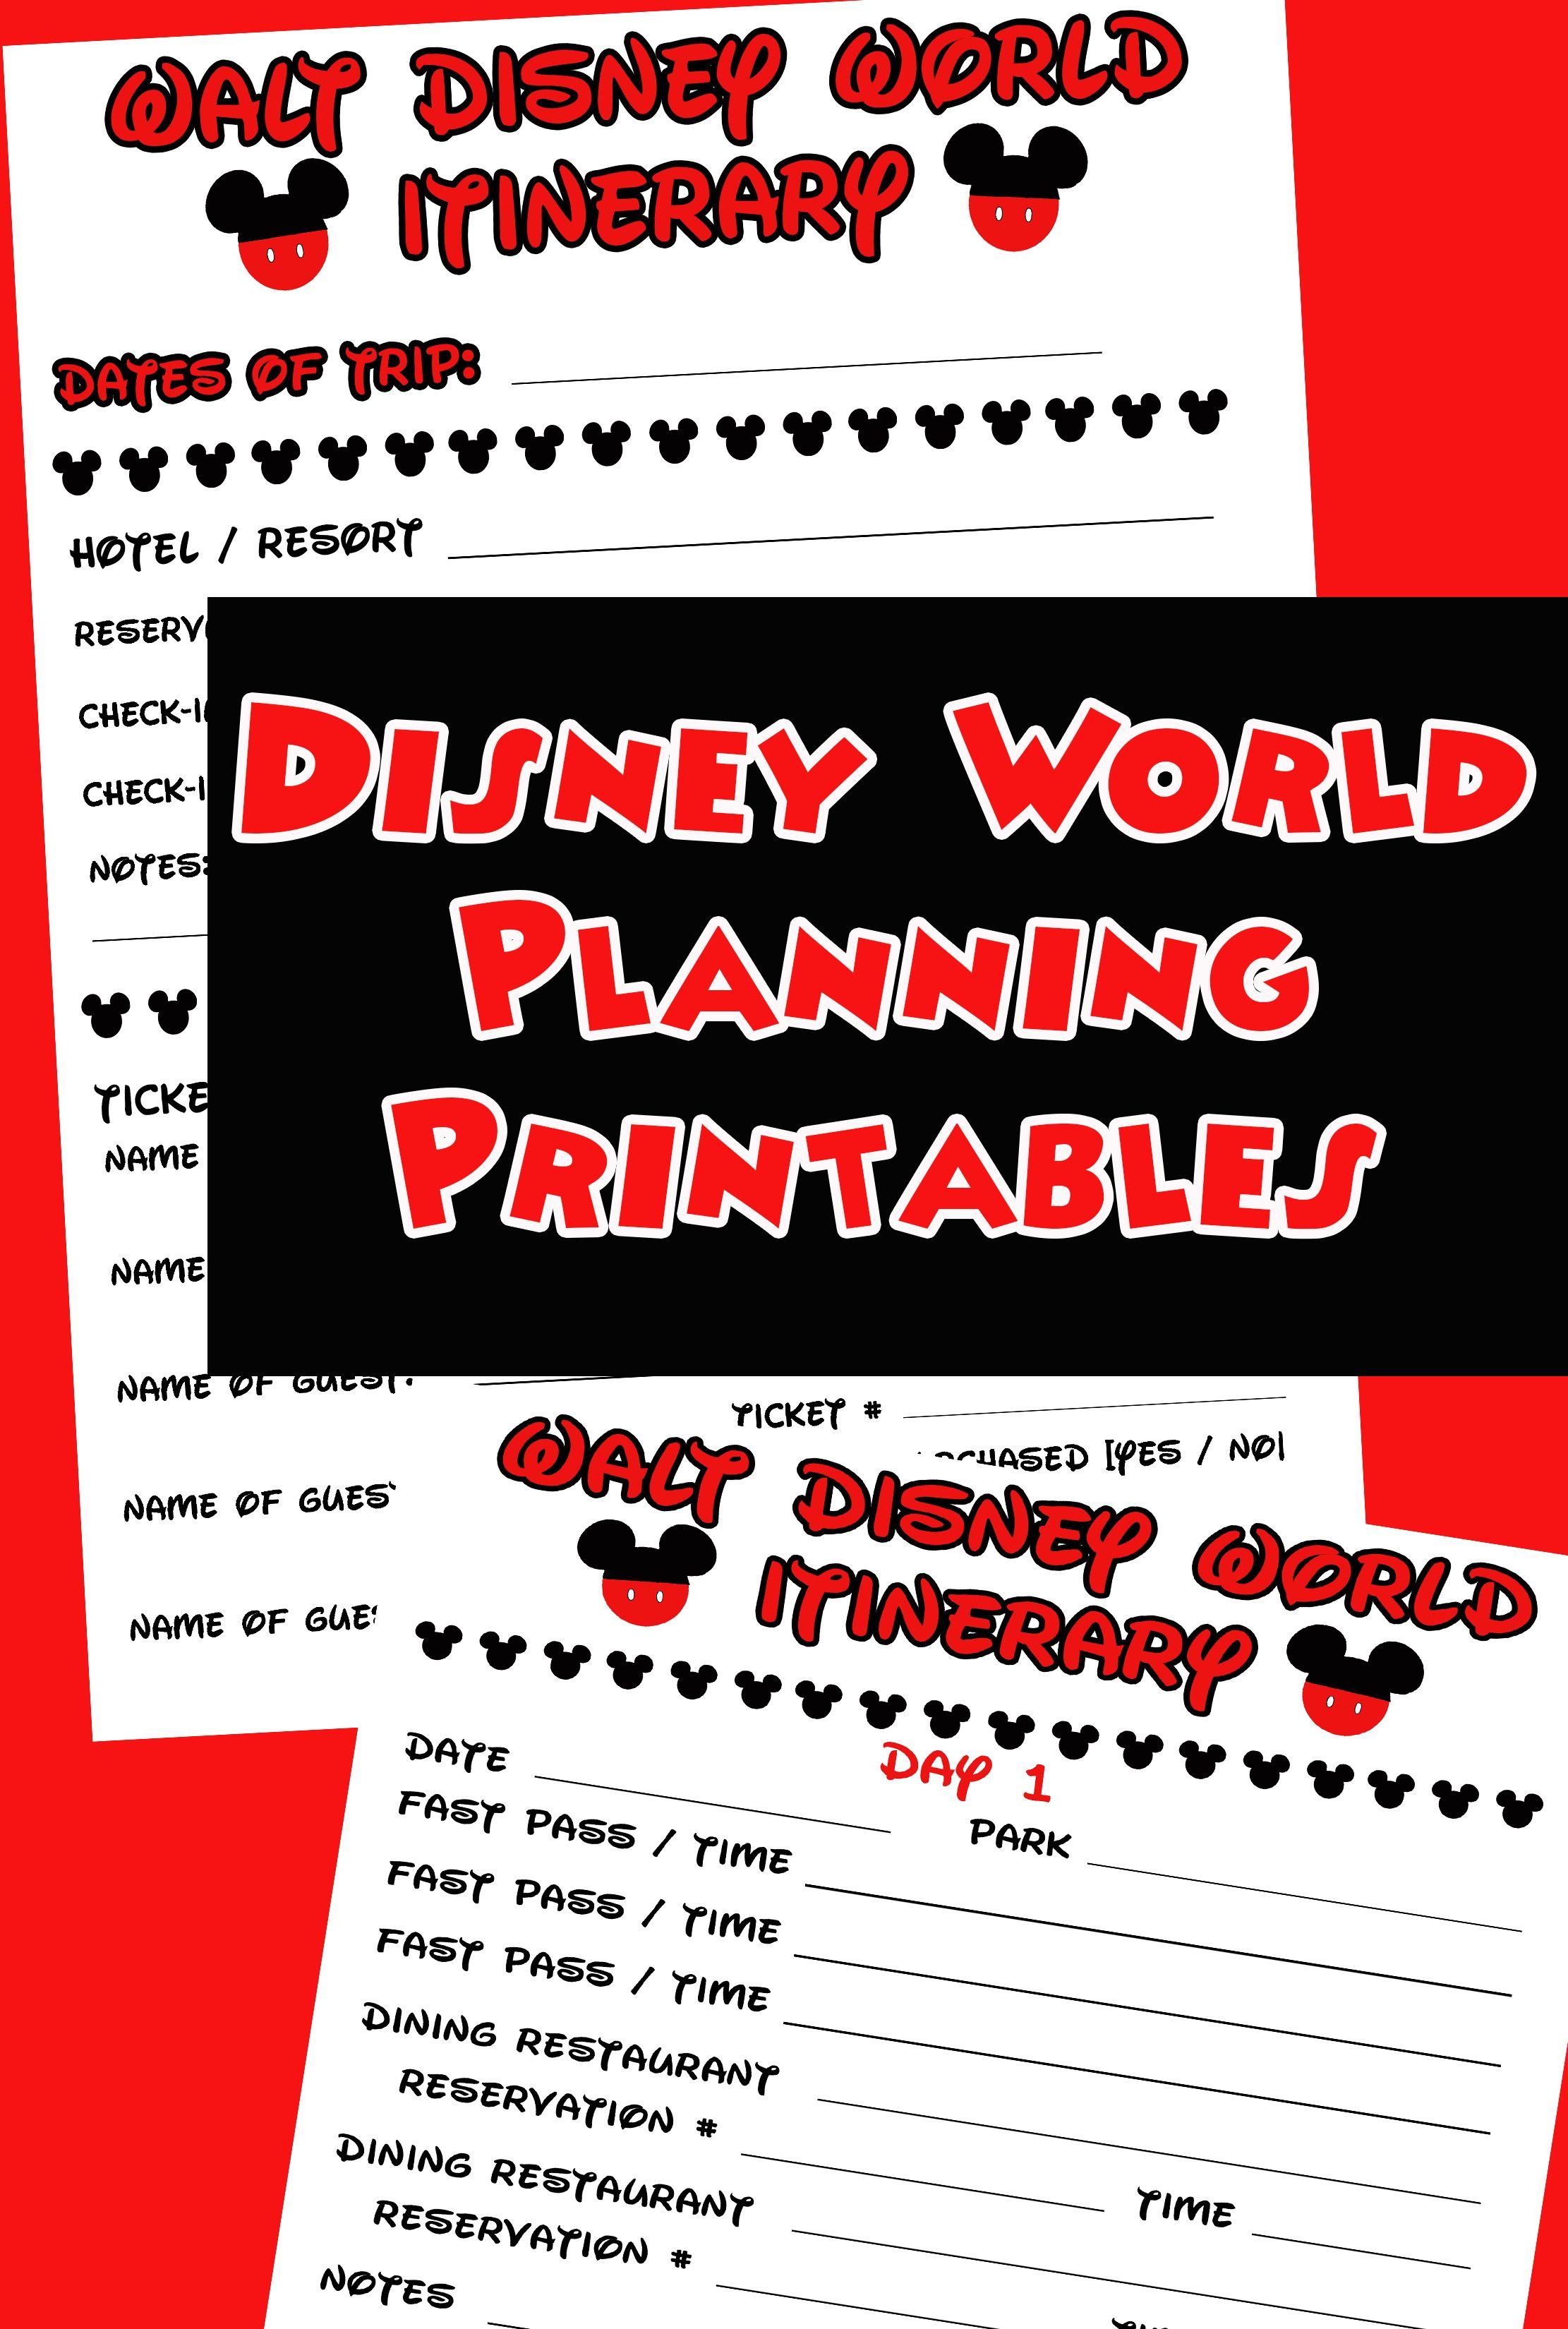 Disney Agenda & Itinerary Free Printable | Disney World 2017 intended for Printable Disney Itinerary